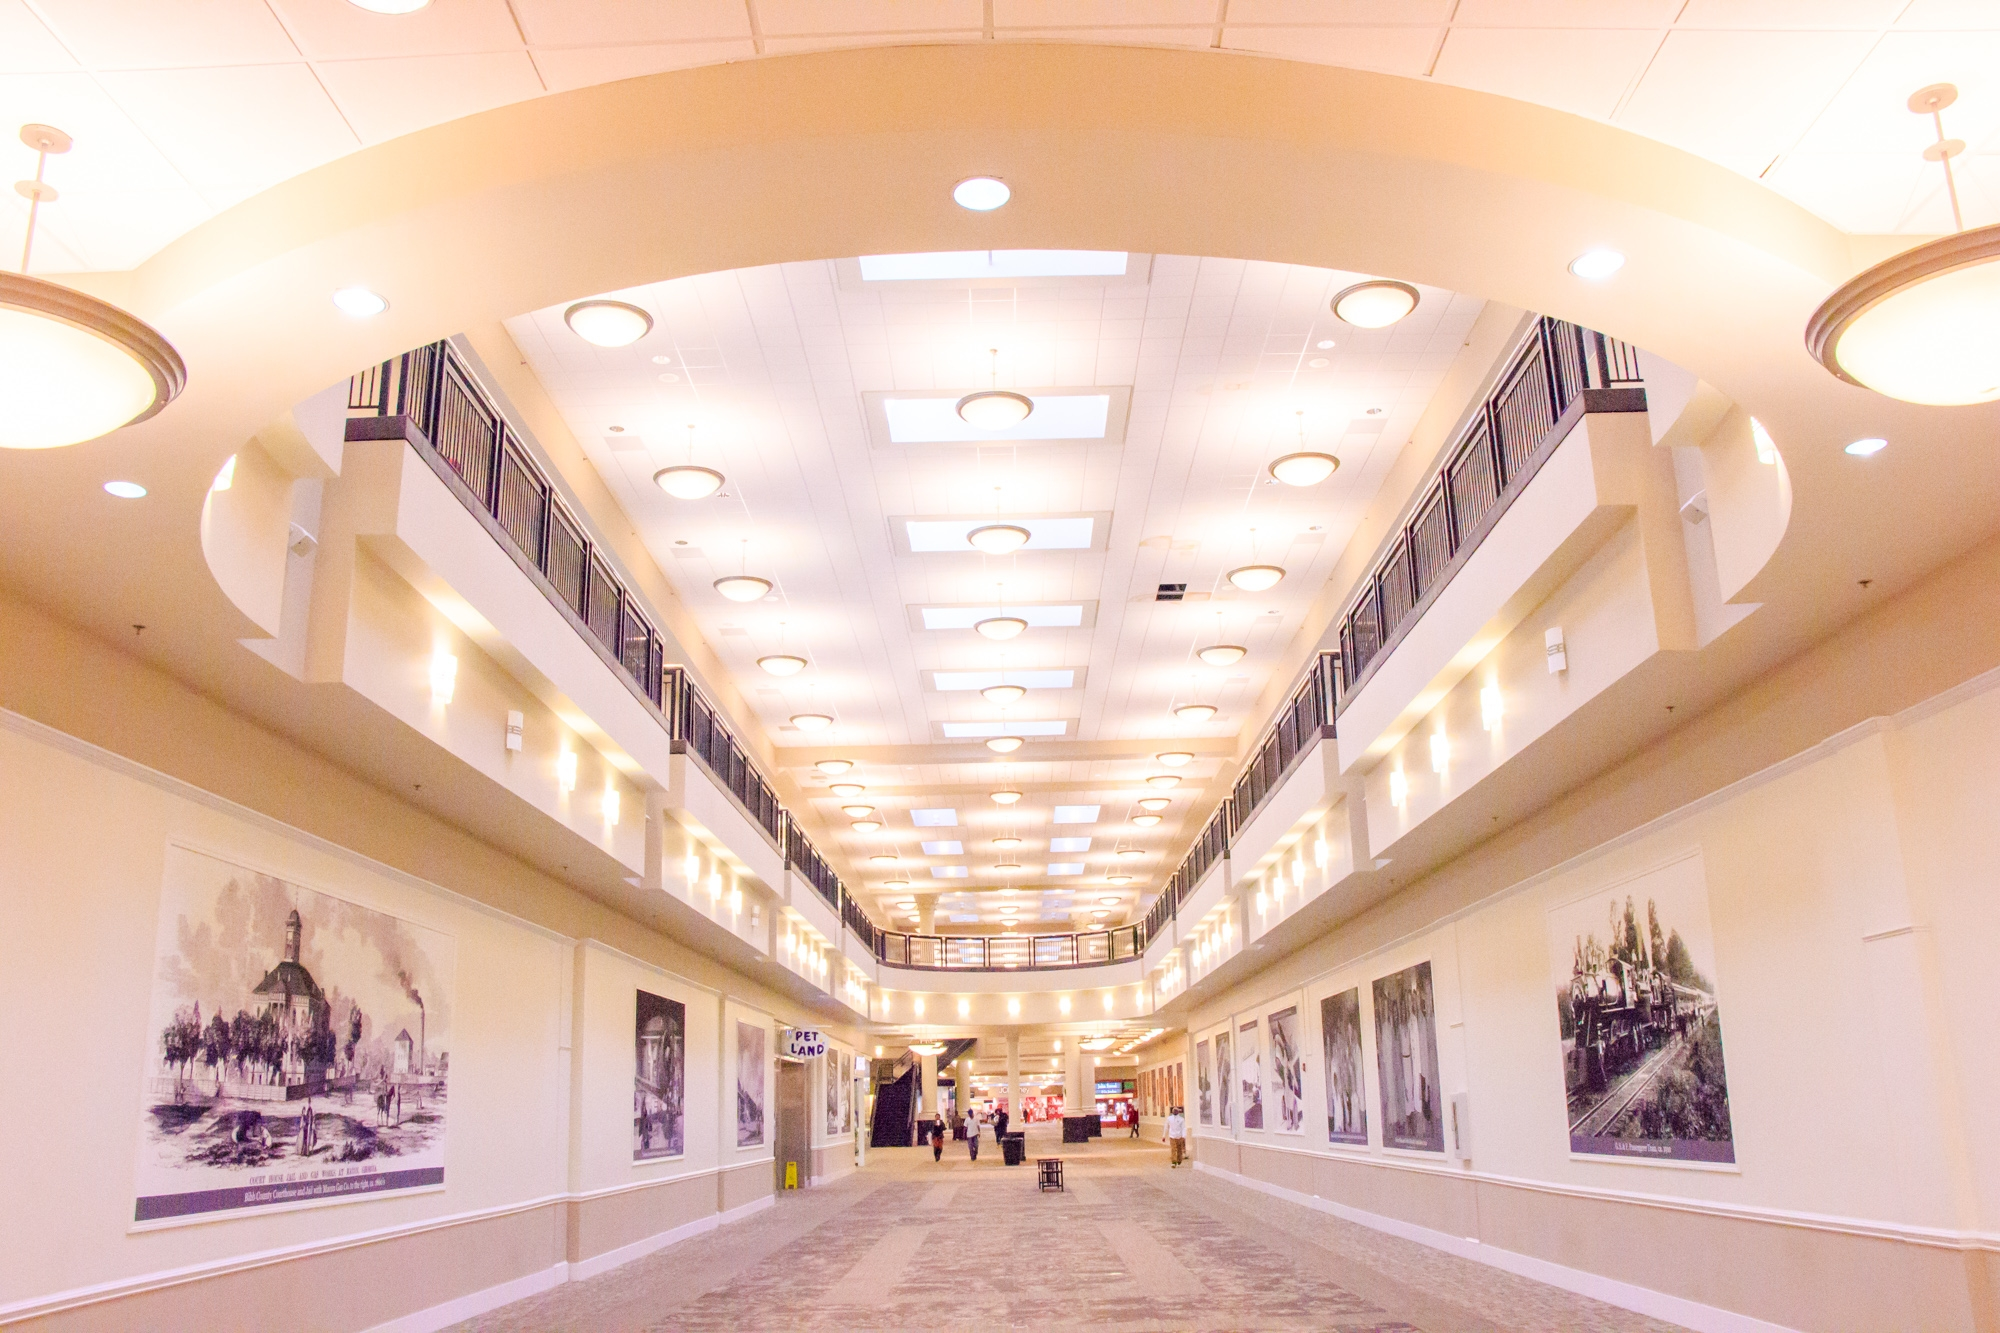 Mall. Macon, Georgia